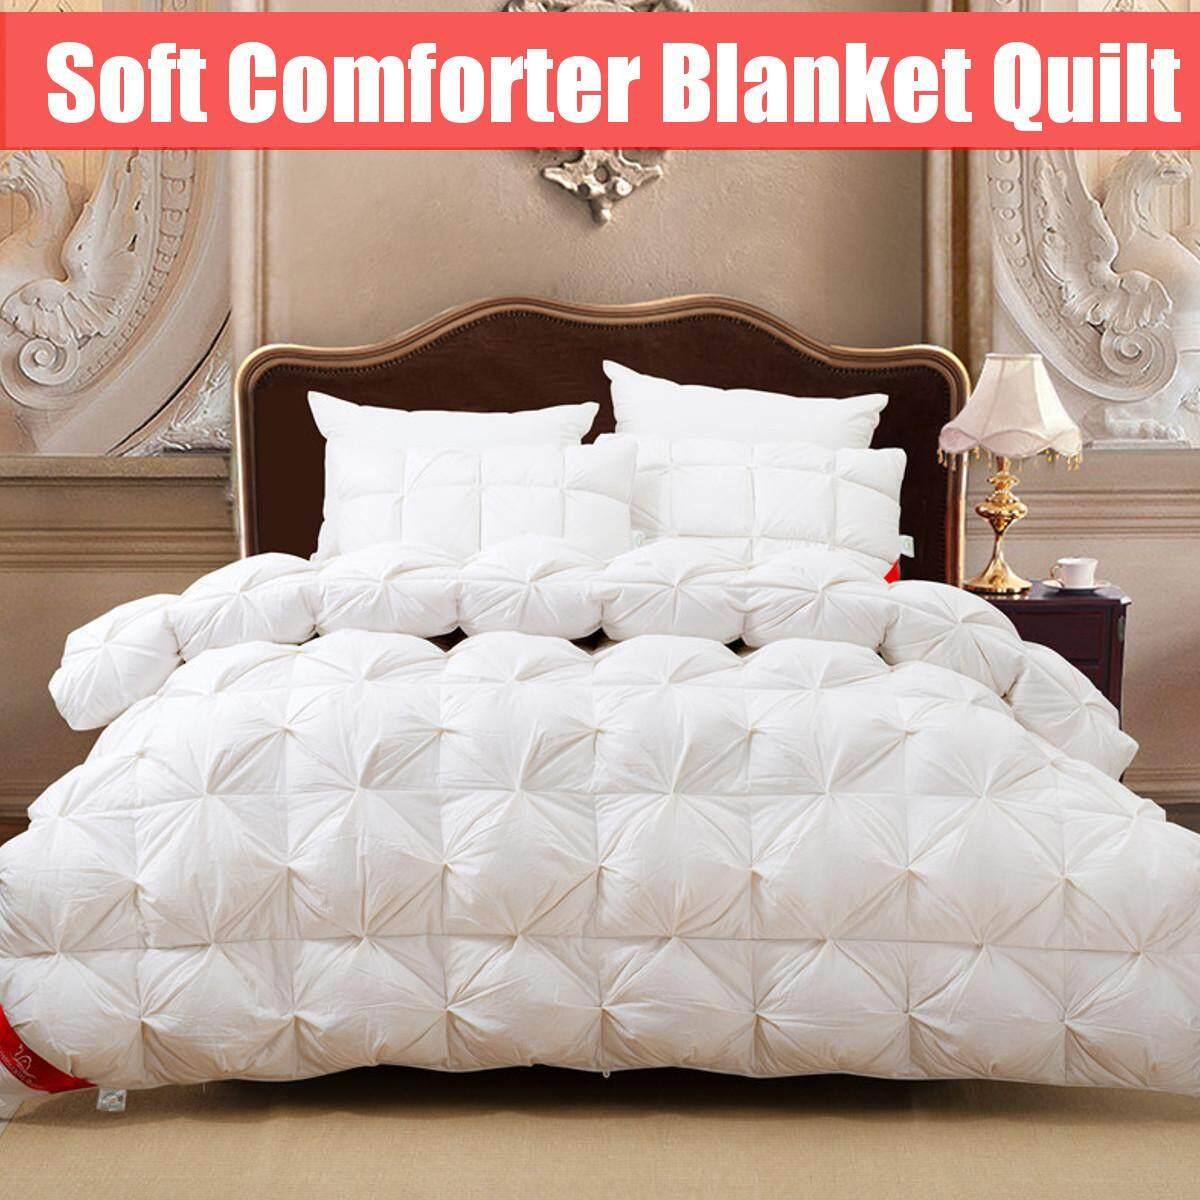 100%goose Down Blanket Comforter Duvet Bedding Throw Shape Quilt Soft Filler Ups 200x230cm - Intl By Audew.